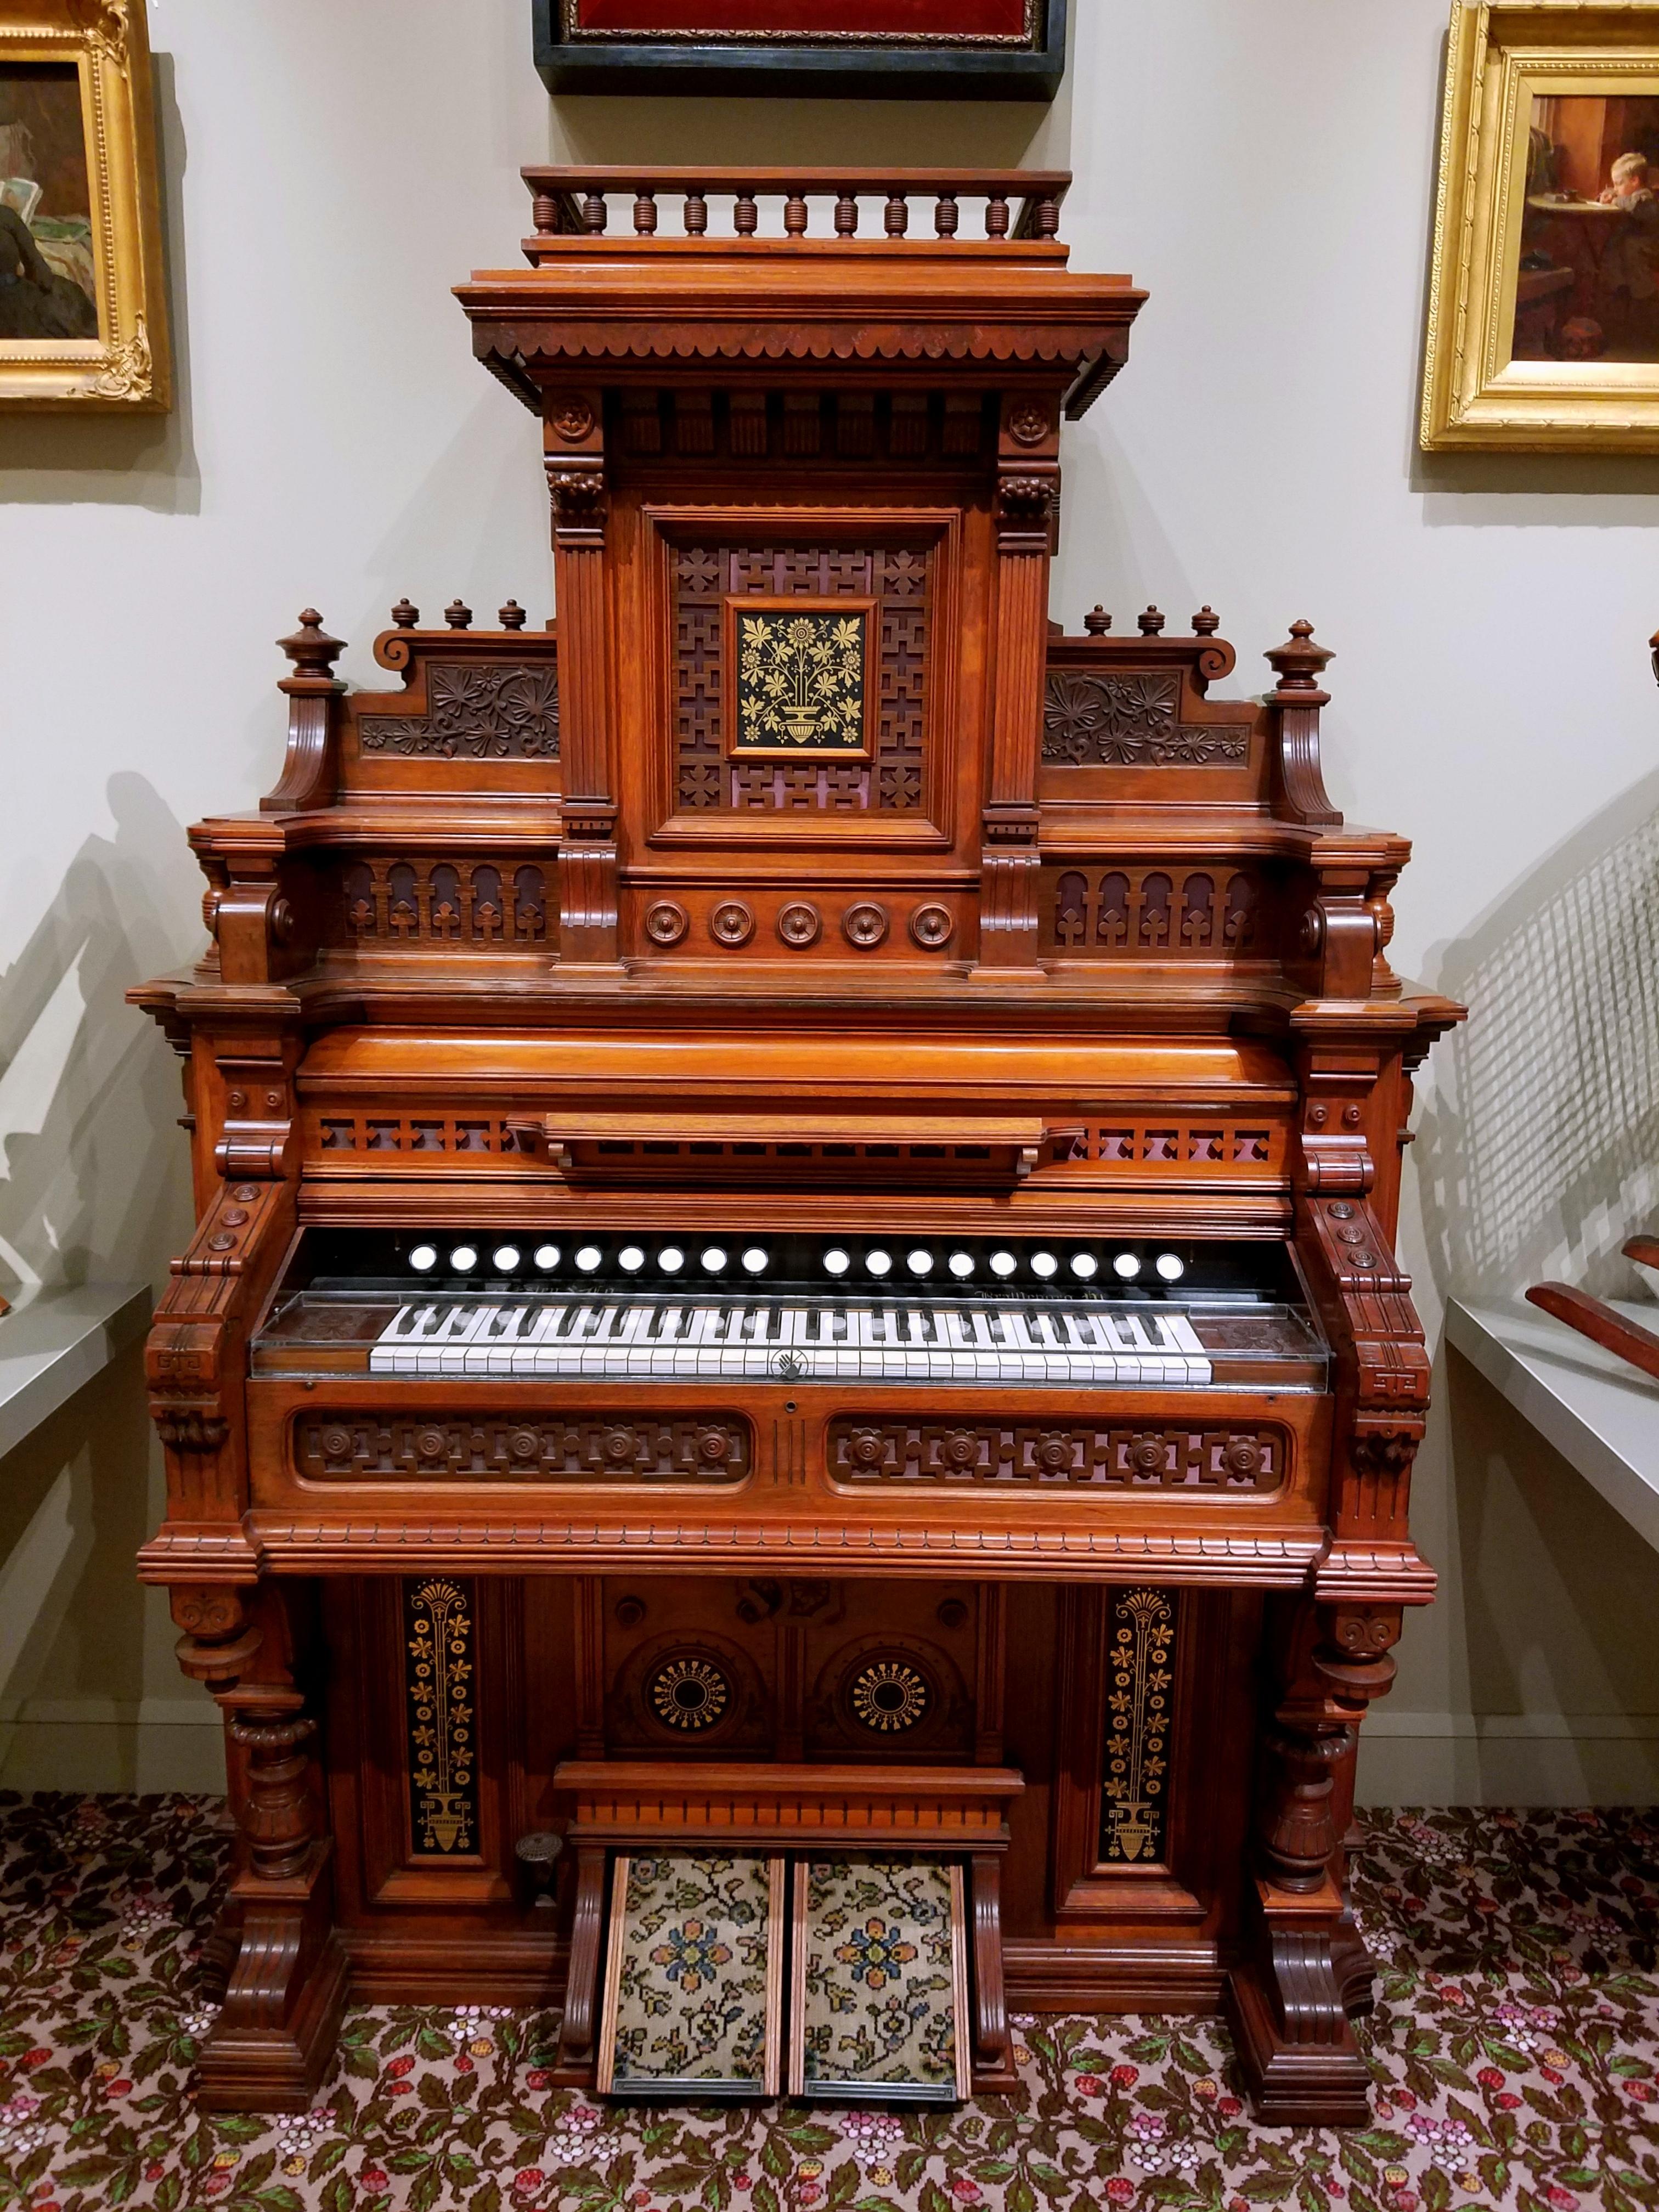 File:Reed organ, Grand Salon model, by J. Estey Company